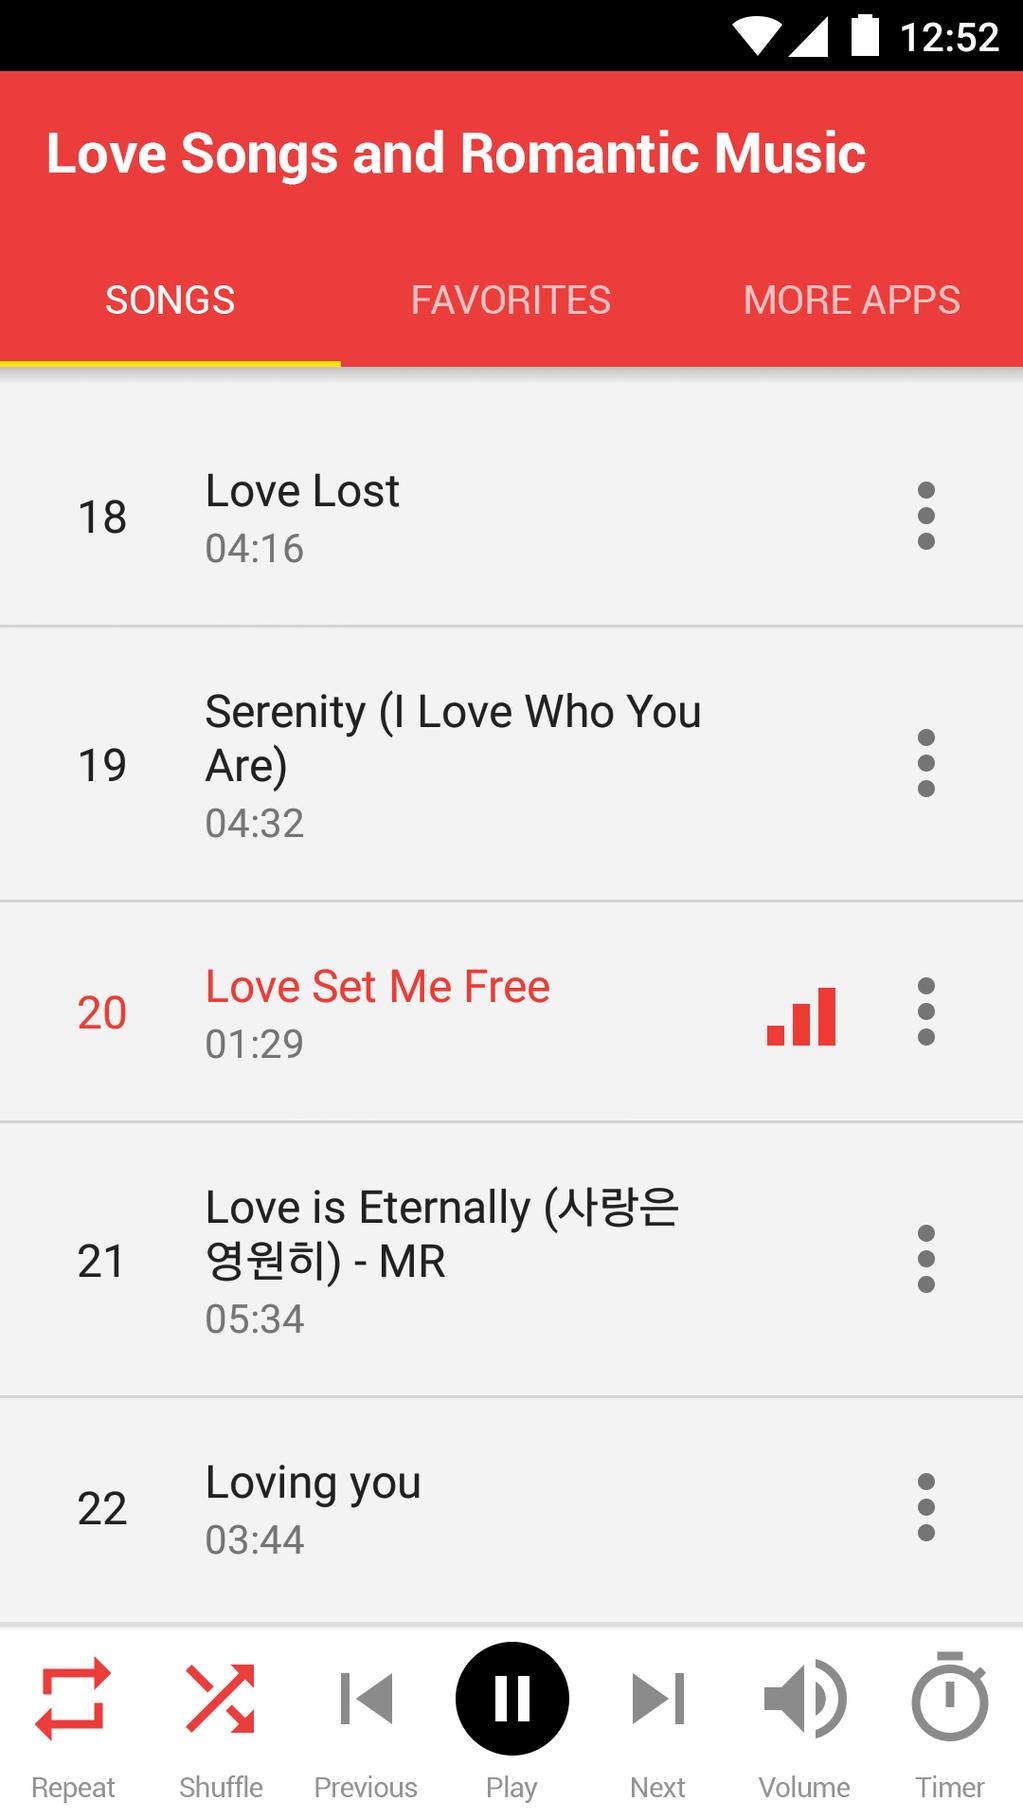 Love Songs and Romantic Music Screenshot 3